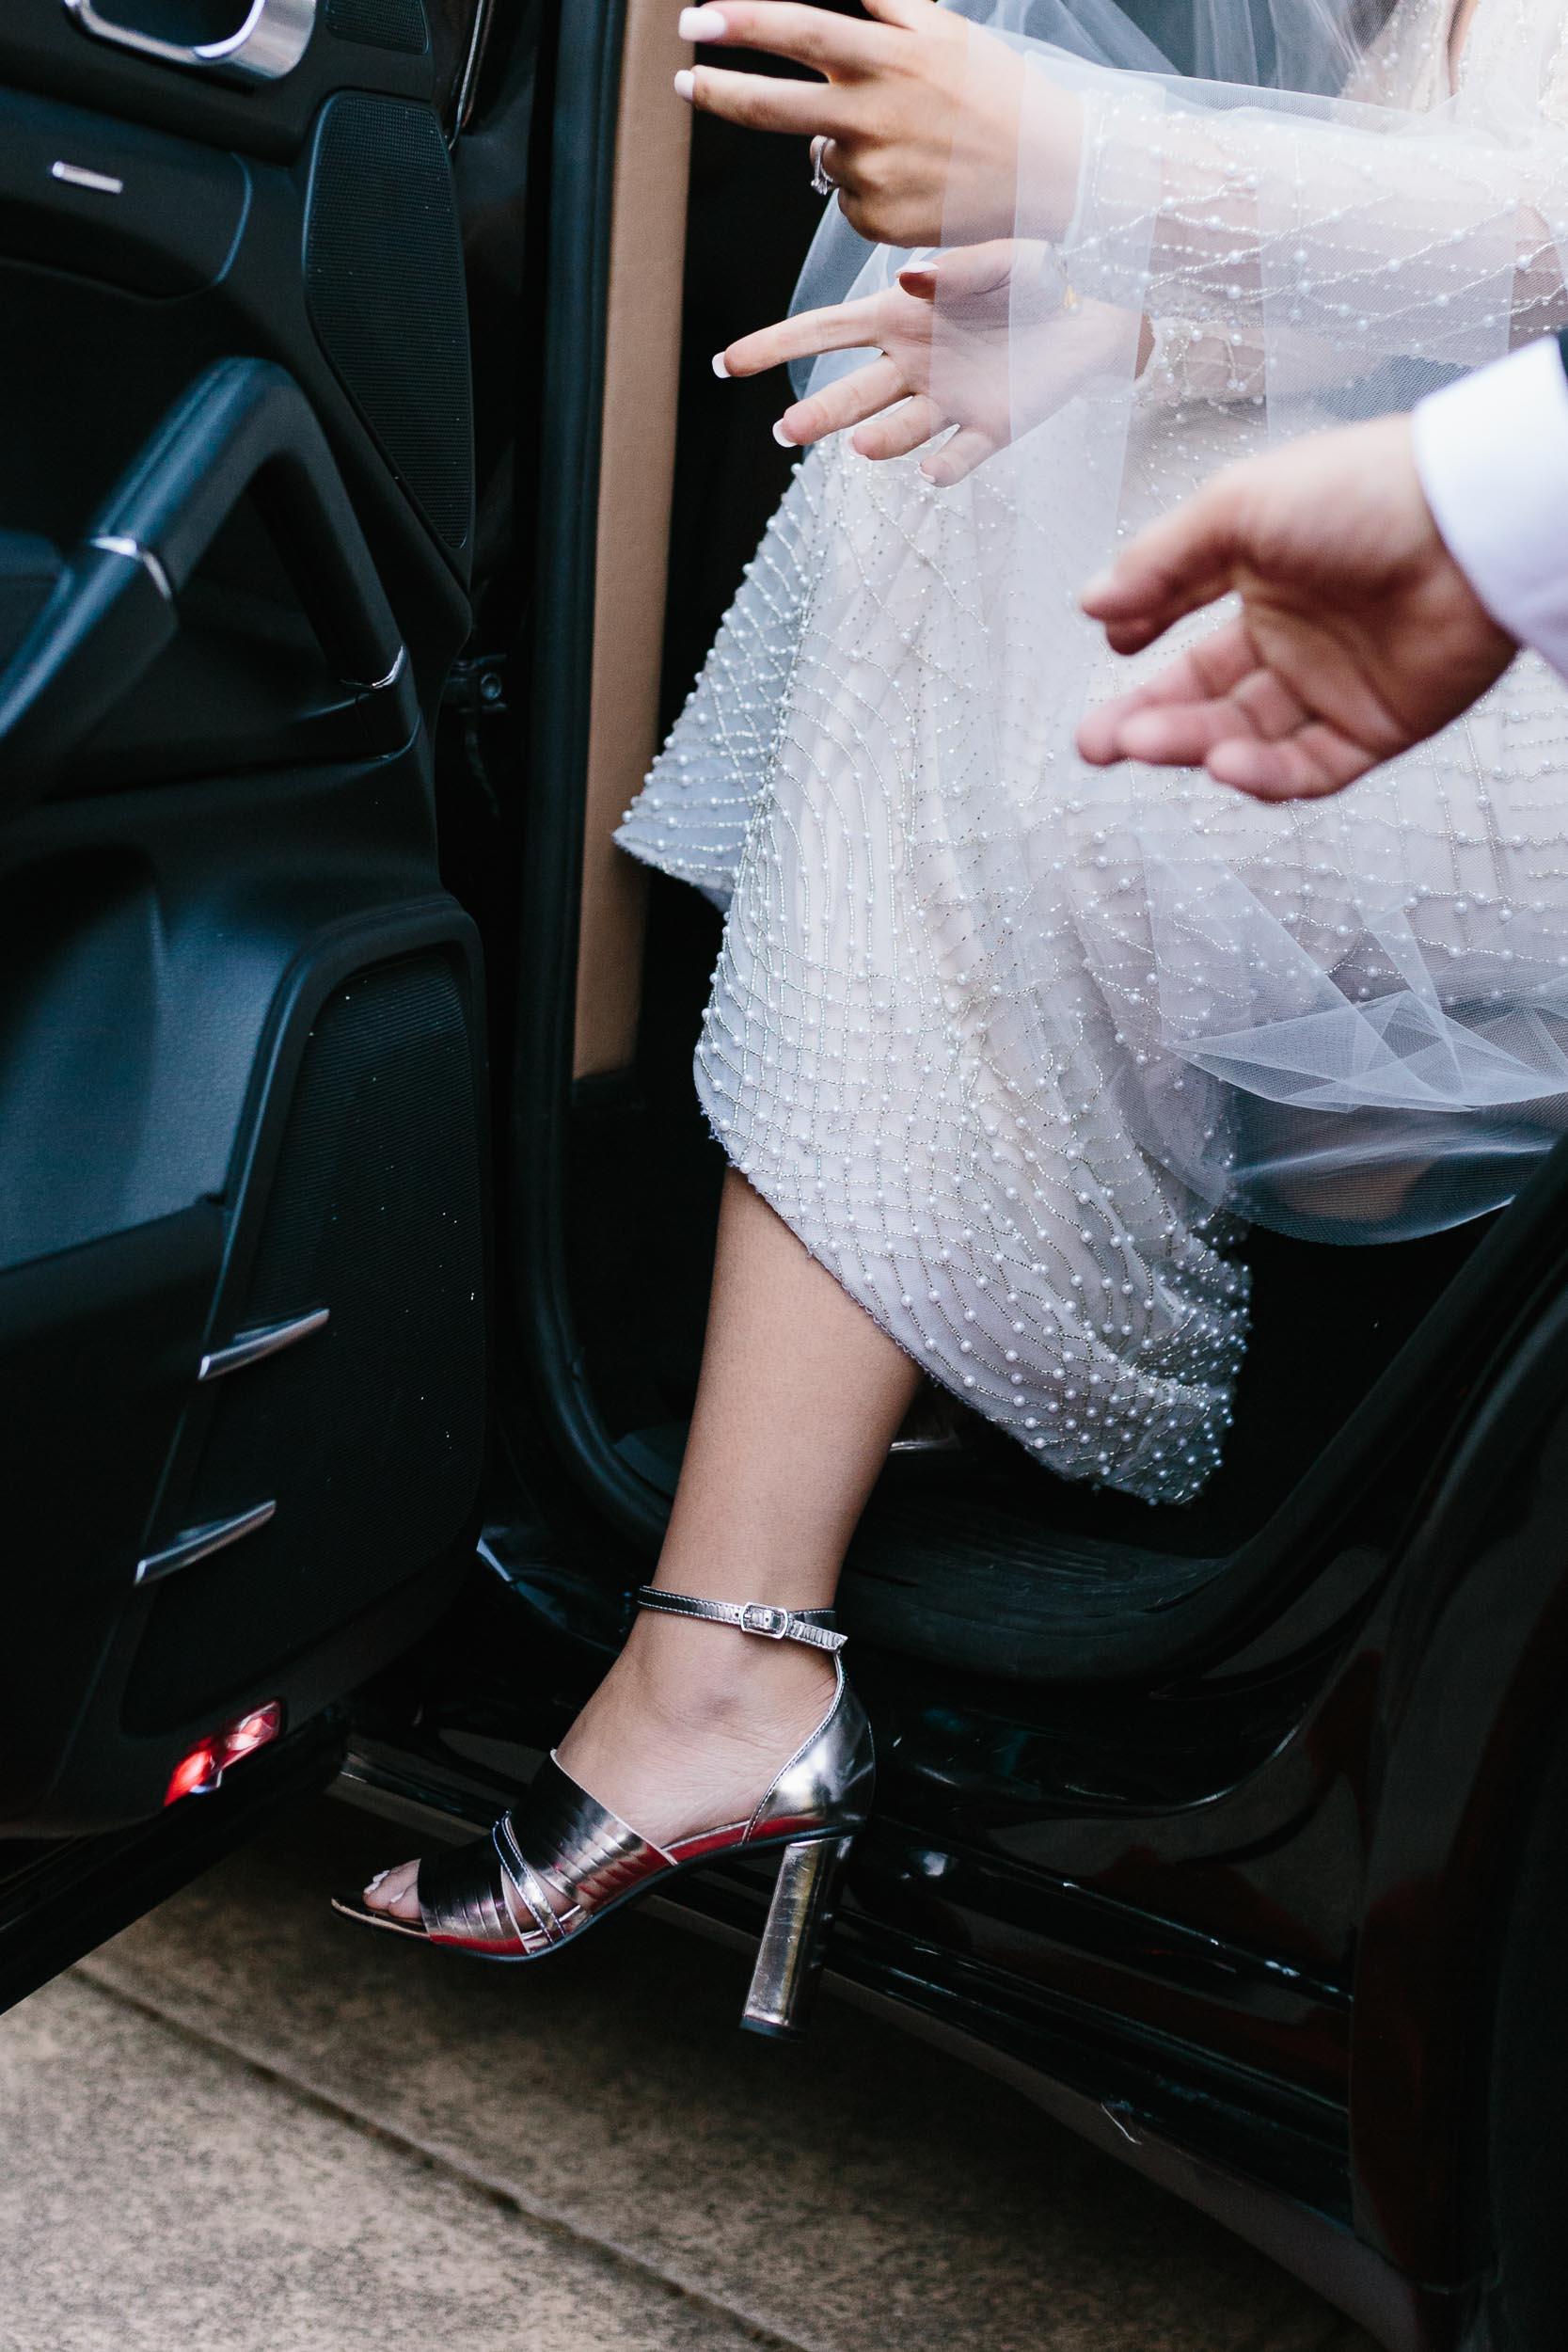 Kas-Richards-Wedding-Photographer-Melbourne-City-Wedding-Alto-Event-Space-Jane-Hill-Bridal-Gown-22.jpg